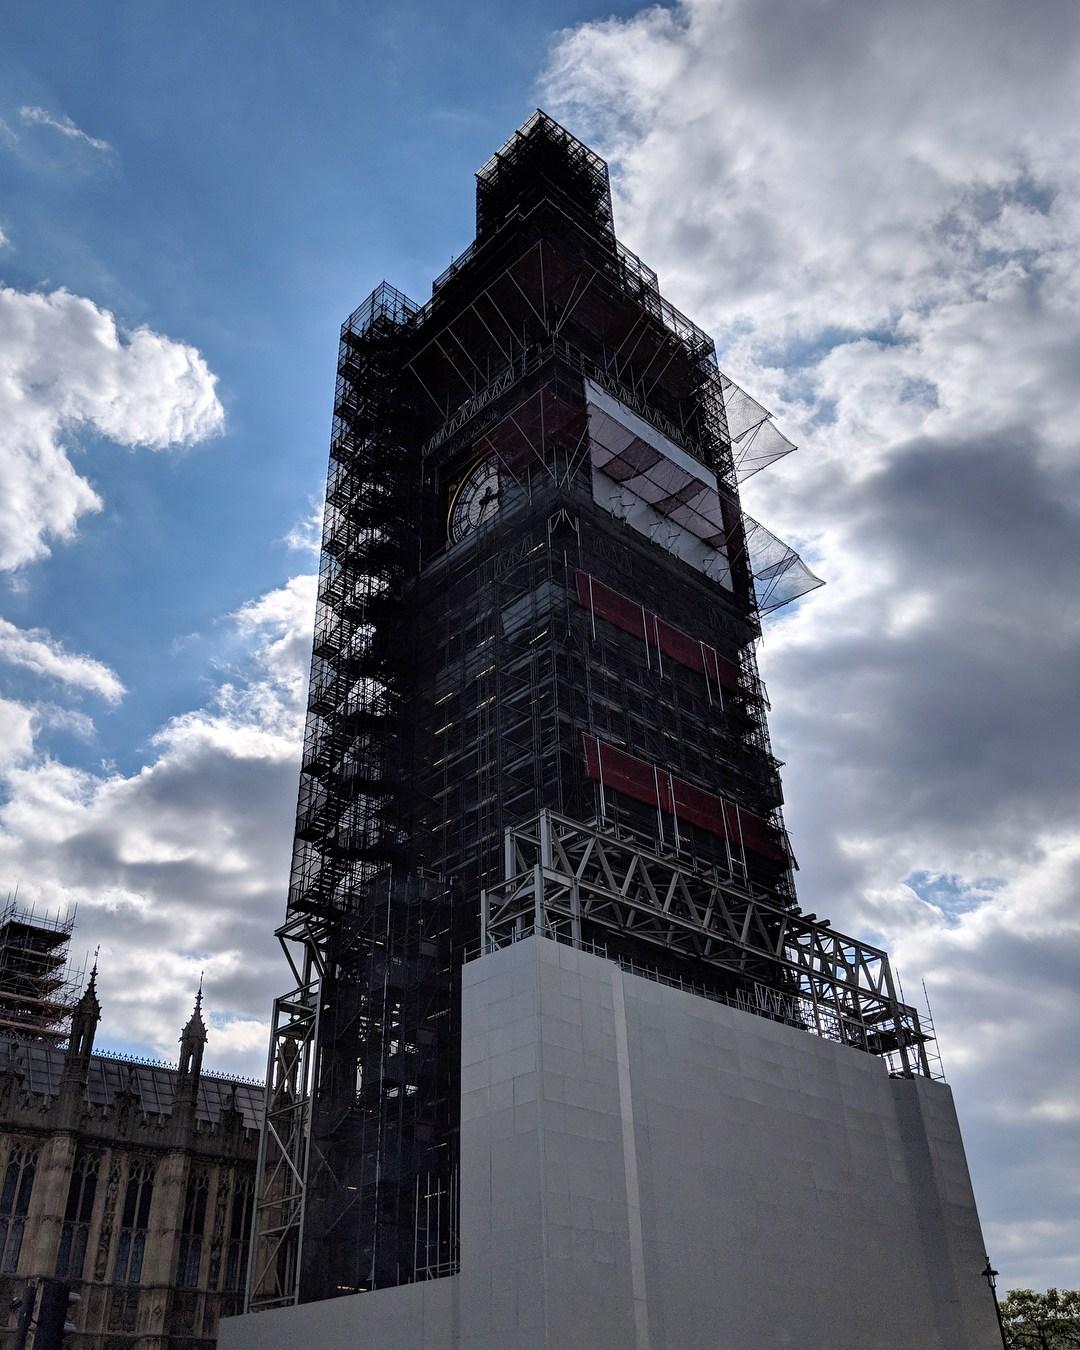 Google Pixel 3 XL camera samples London 9 - تسريب صور يزعم أنها ملتقطة بواسطة كاميرا بكسل 3 XL المرتقب إطلاقه أكتوبر القادم